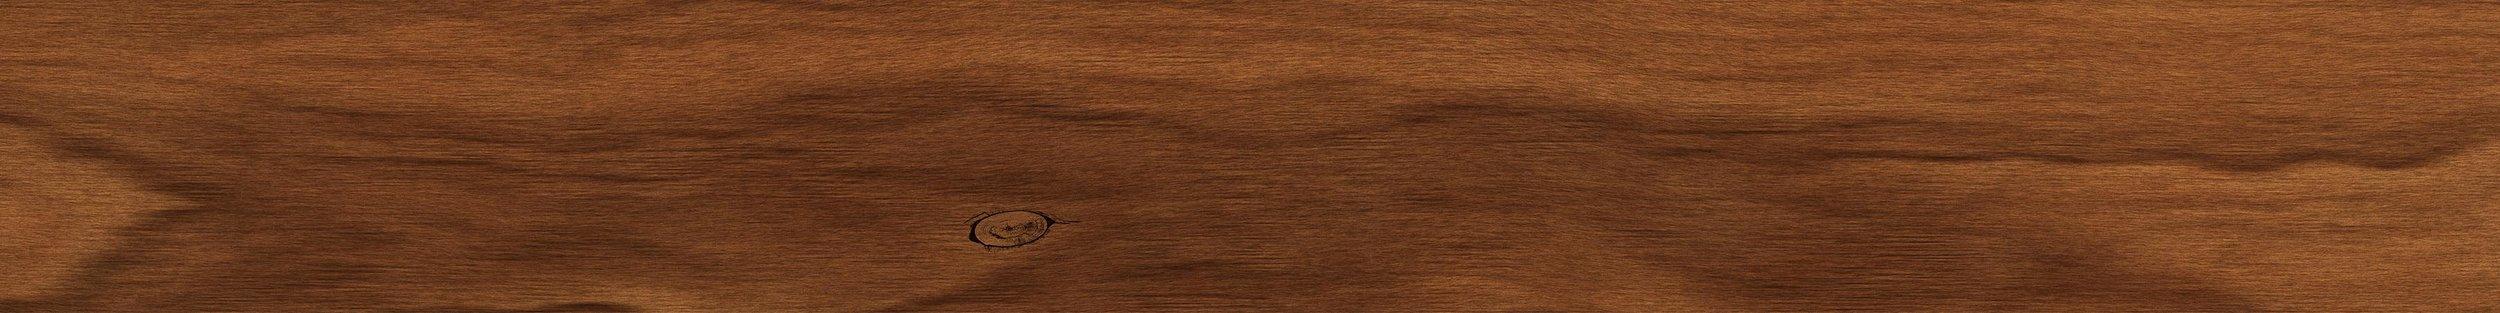 Baywood Plank.jpg